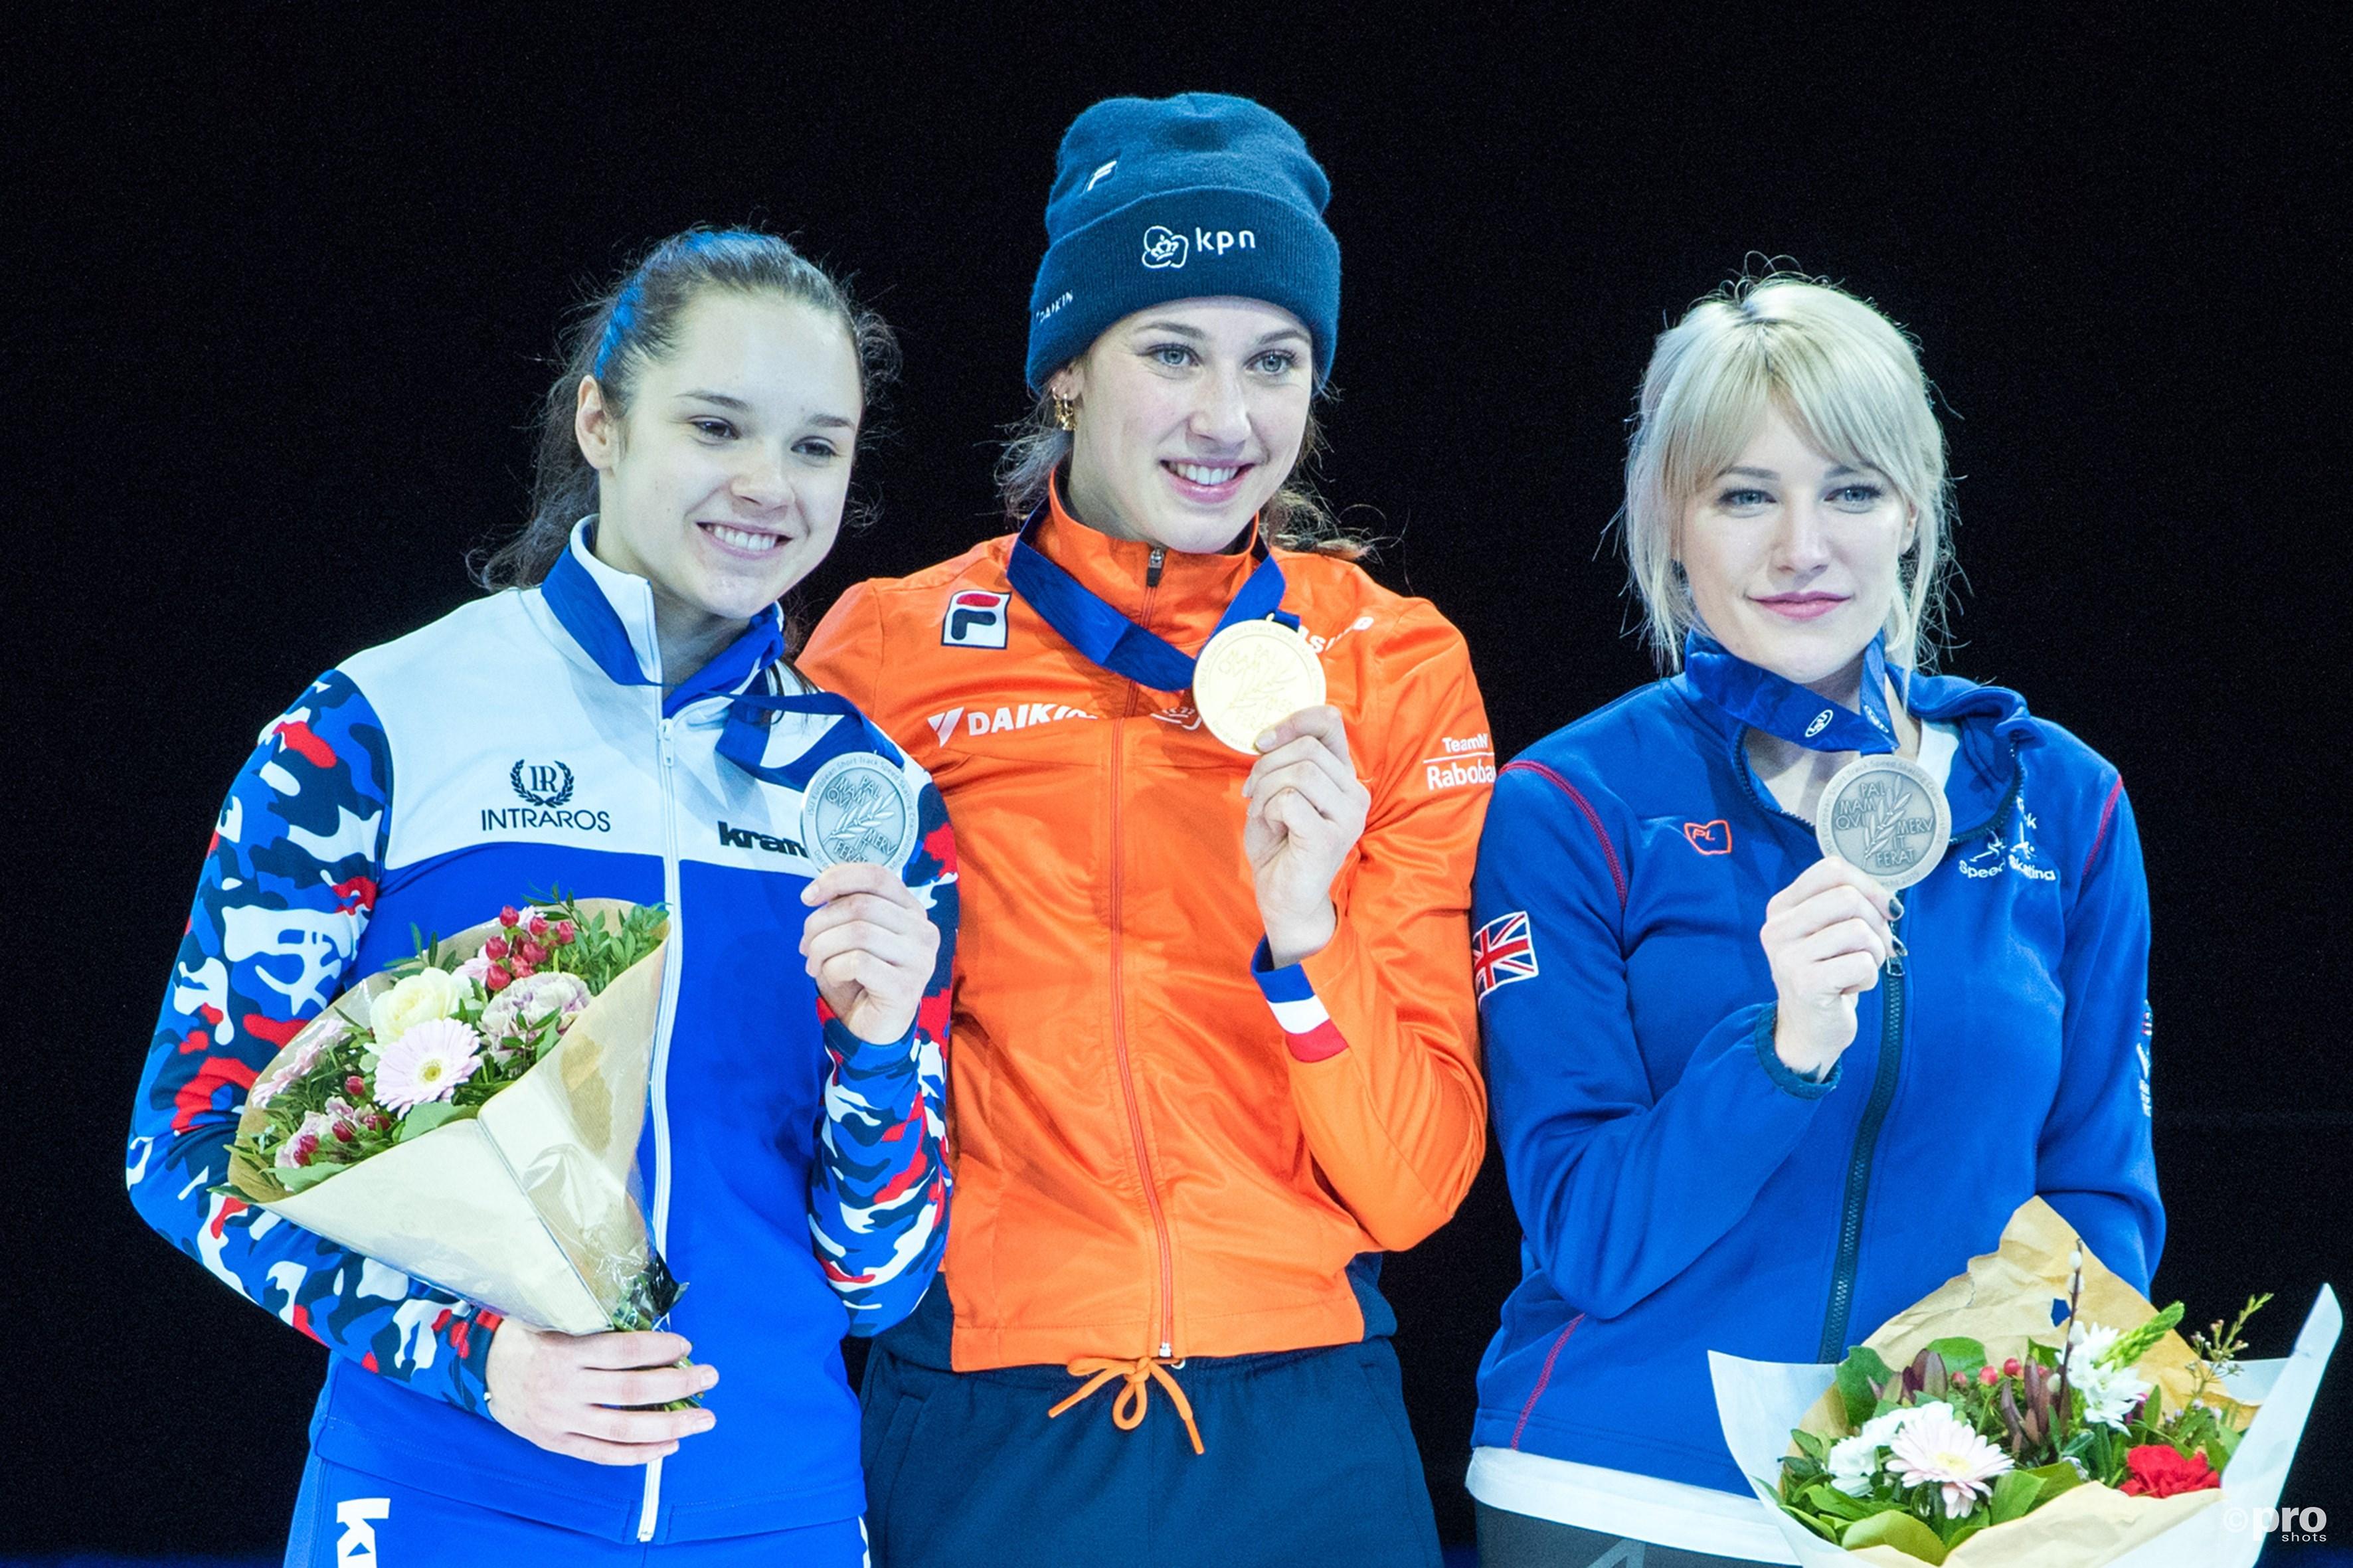 De eerste Europese titel voor Suzanne Schulting. (PRO SHOTS/Ankie Hogewind)